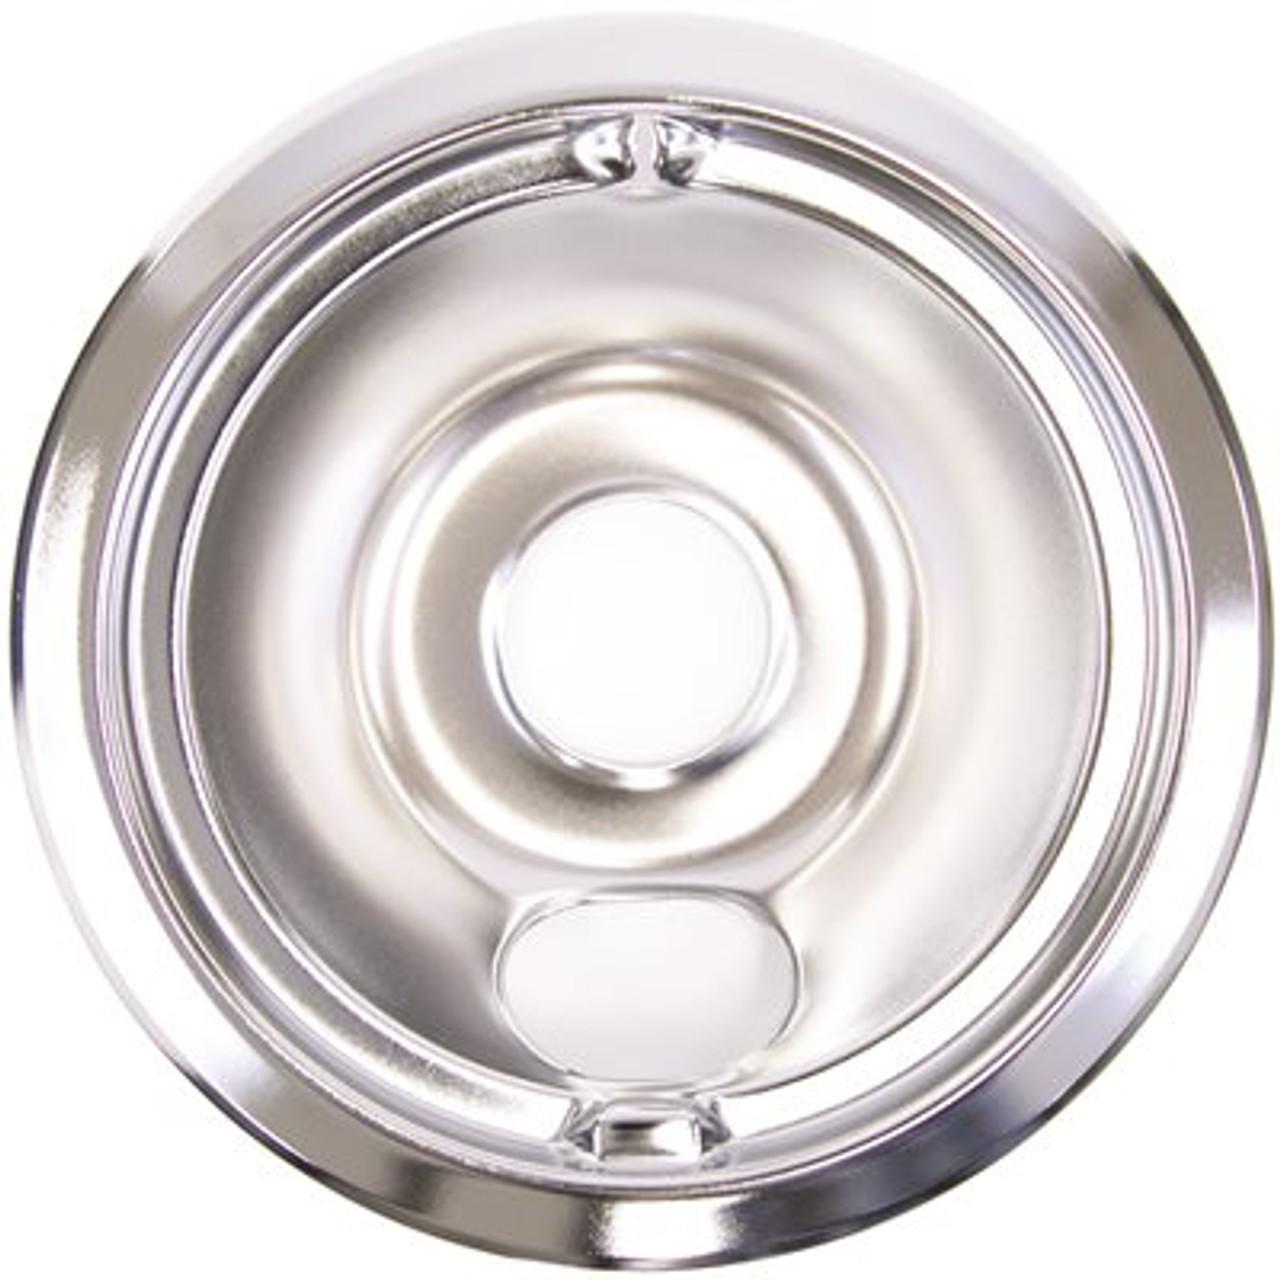 Whirlpool Stove Drip Bowl 4164315 4157961 3195208 3148357 308539 306796 305837Y